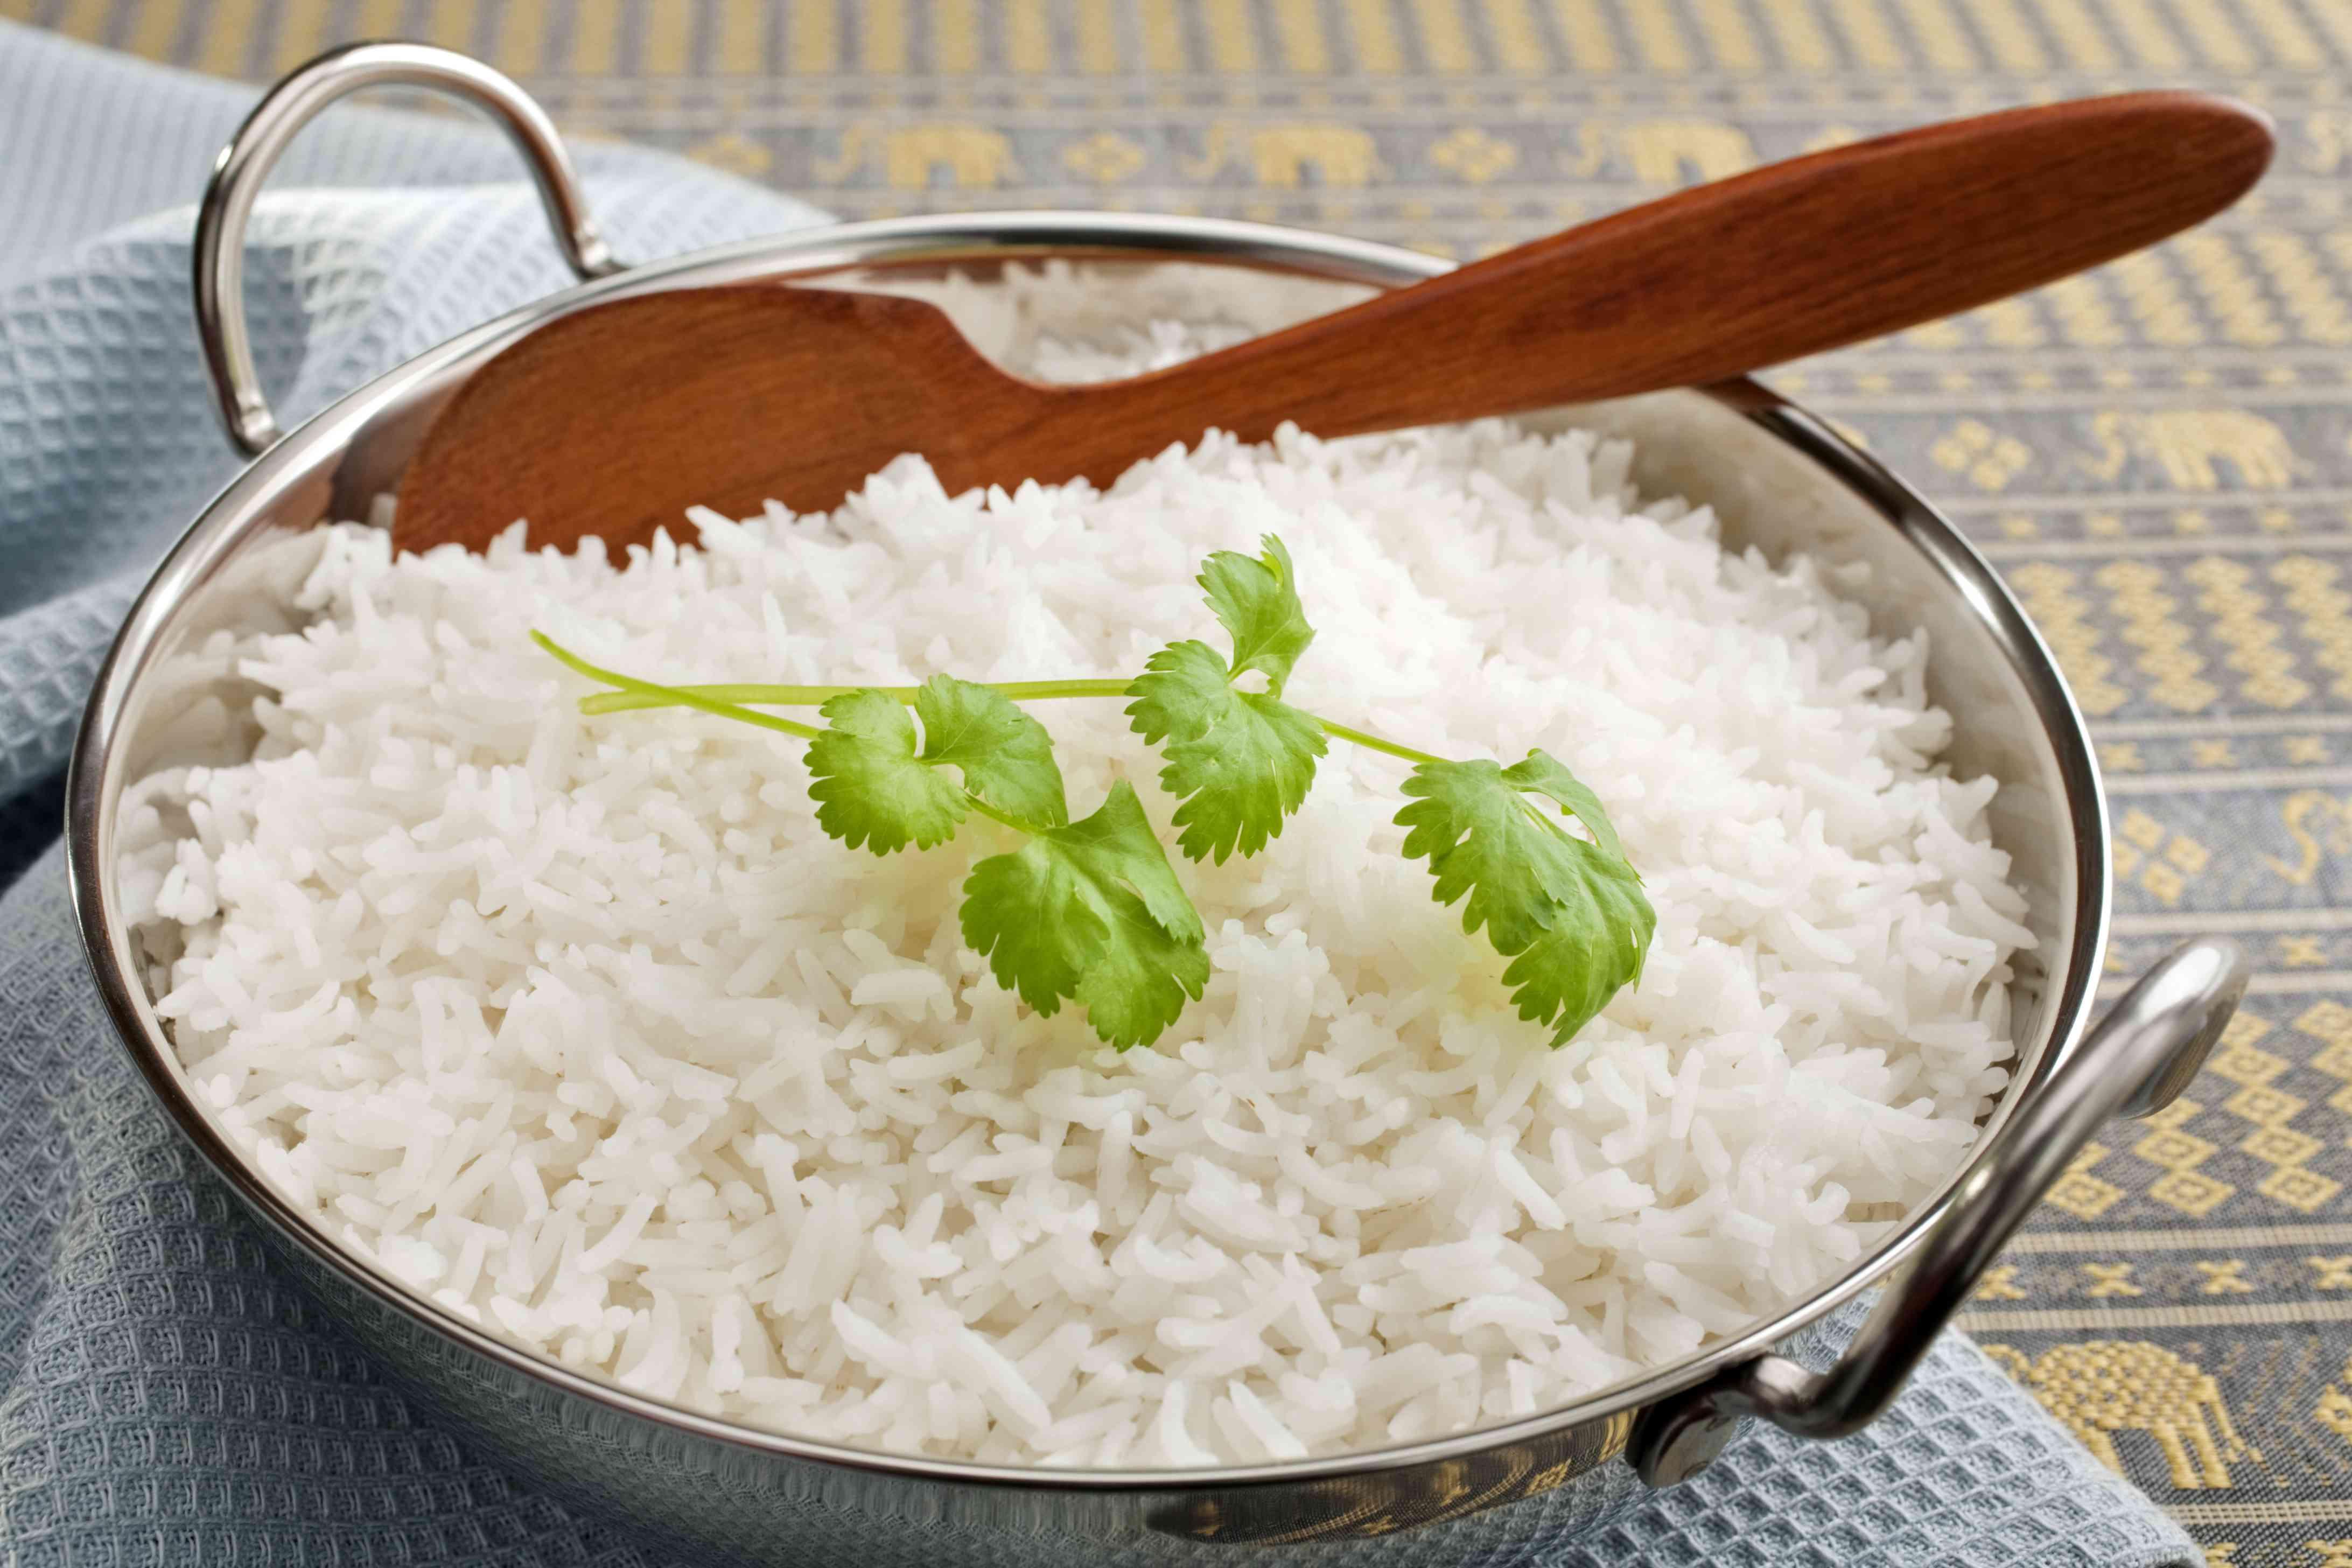 Basmati Rice with Coriander in a Balti Dish